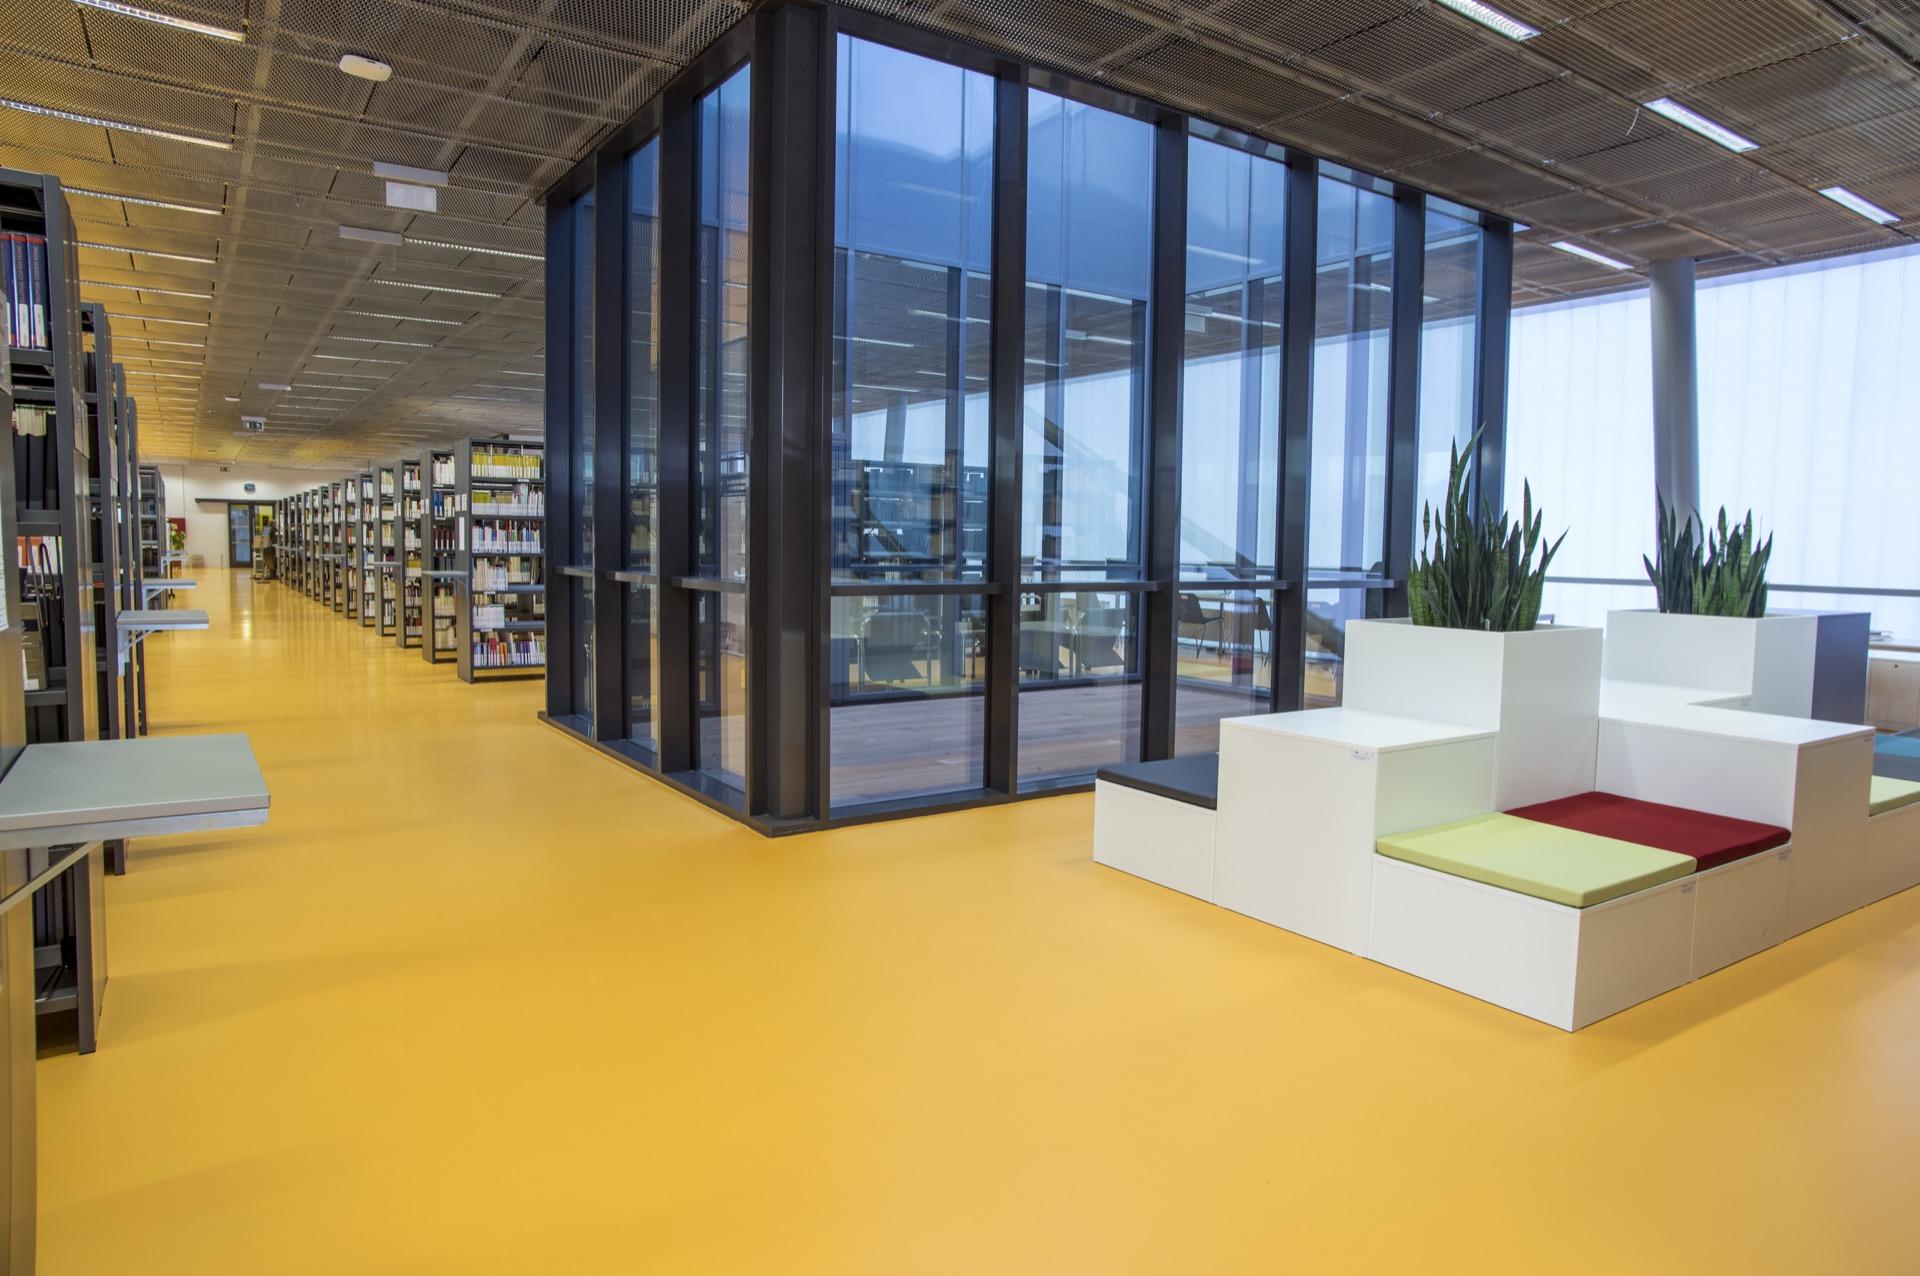 UJEP Jan Evangelista Purkyne University Ústí nad Labem library building architecture design interior view